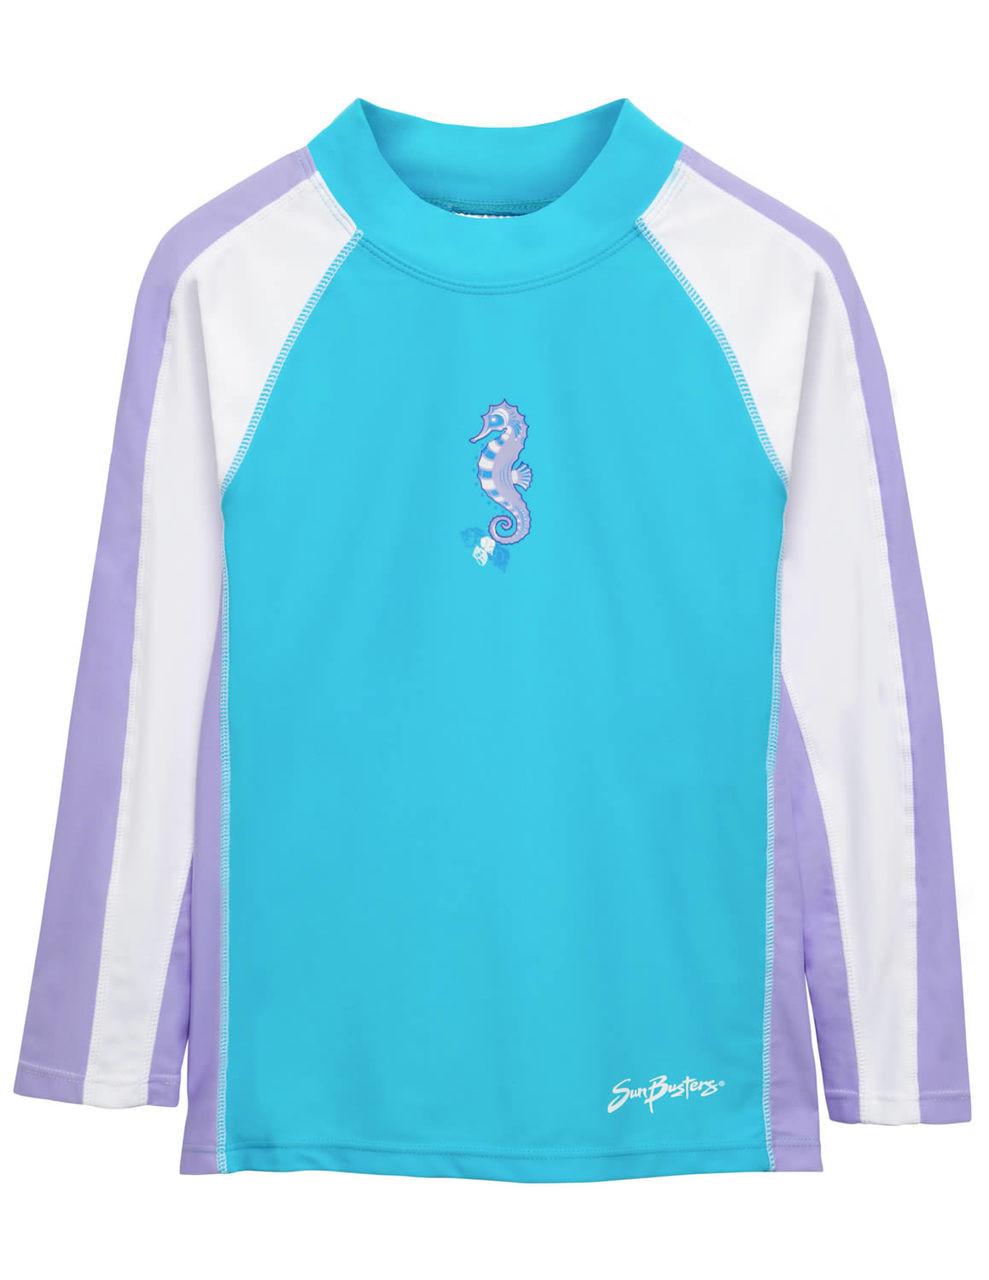 eea05fed32fb3 Girls Sun Busters L/S Rashguard Swim Shirt Maui Blue | Boys UV Clothing